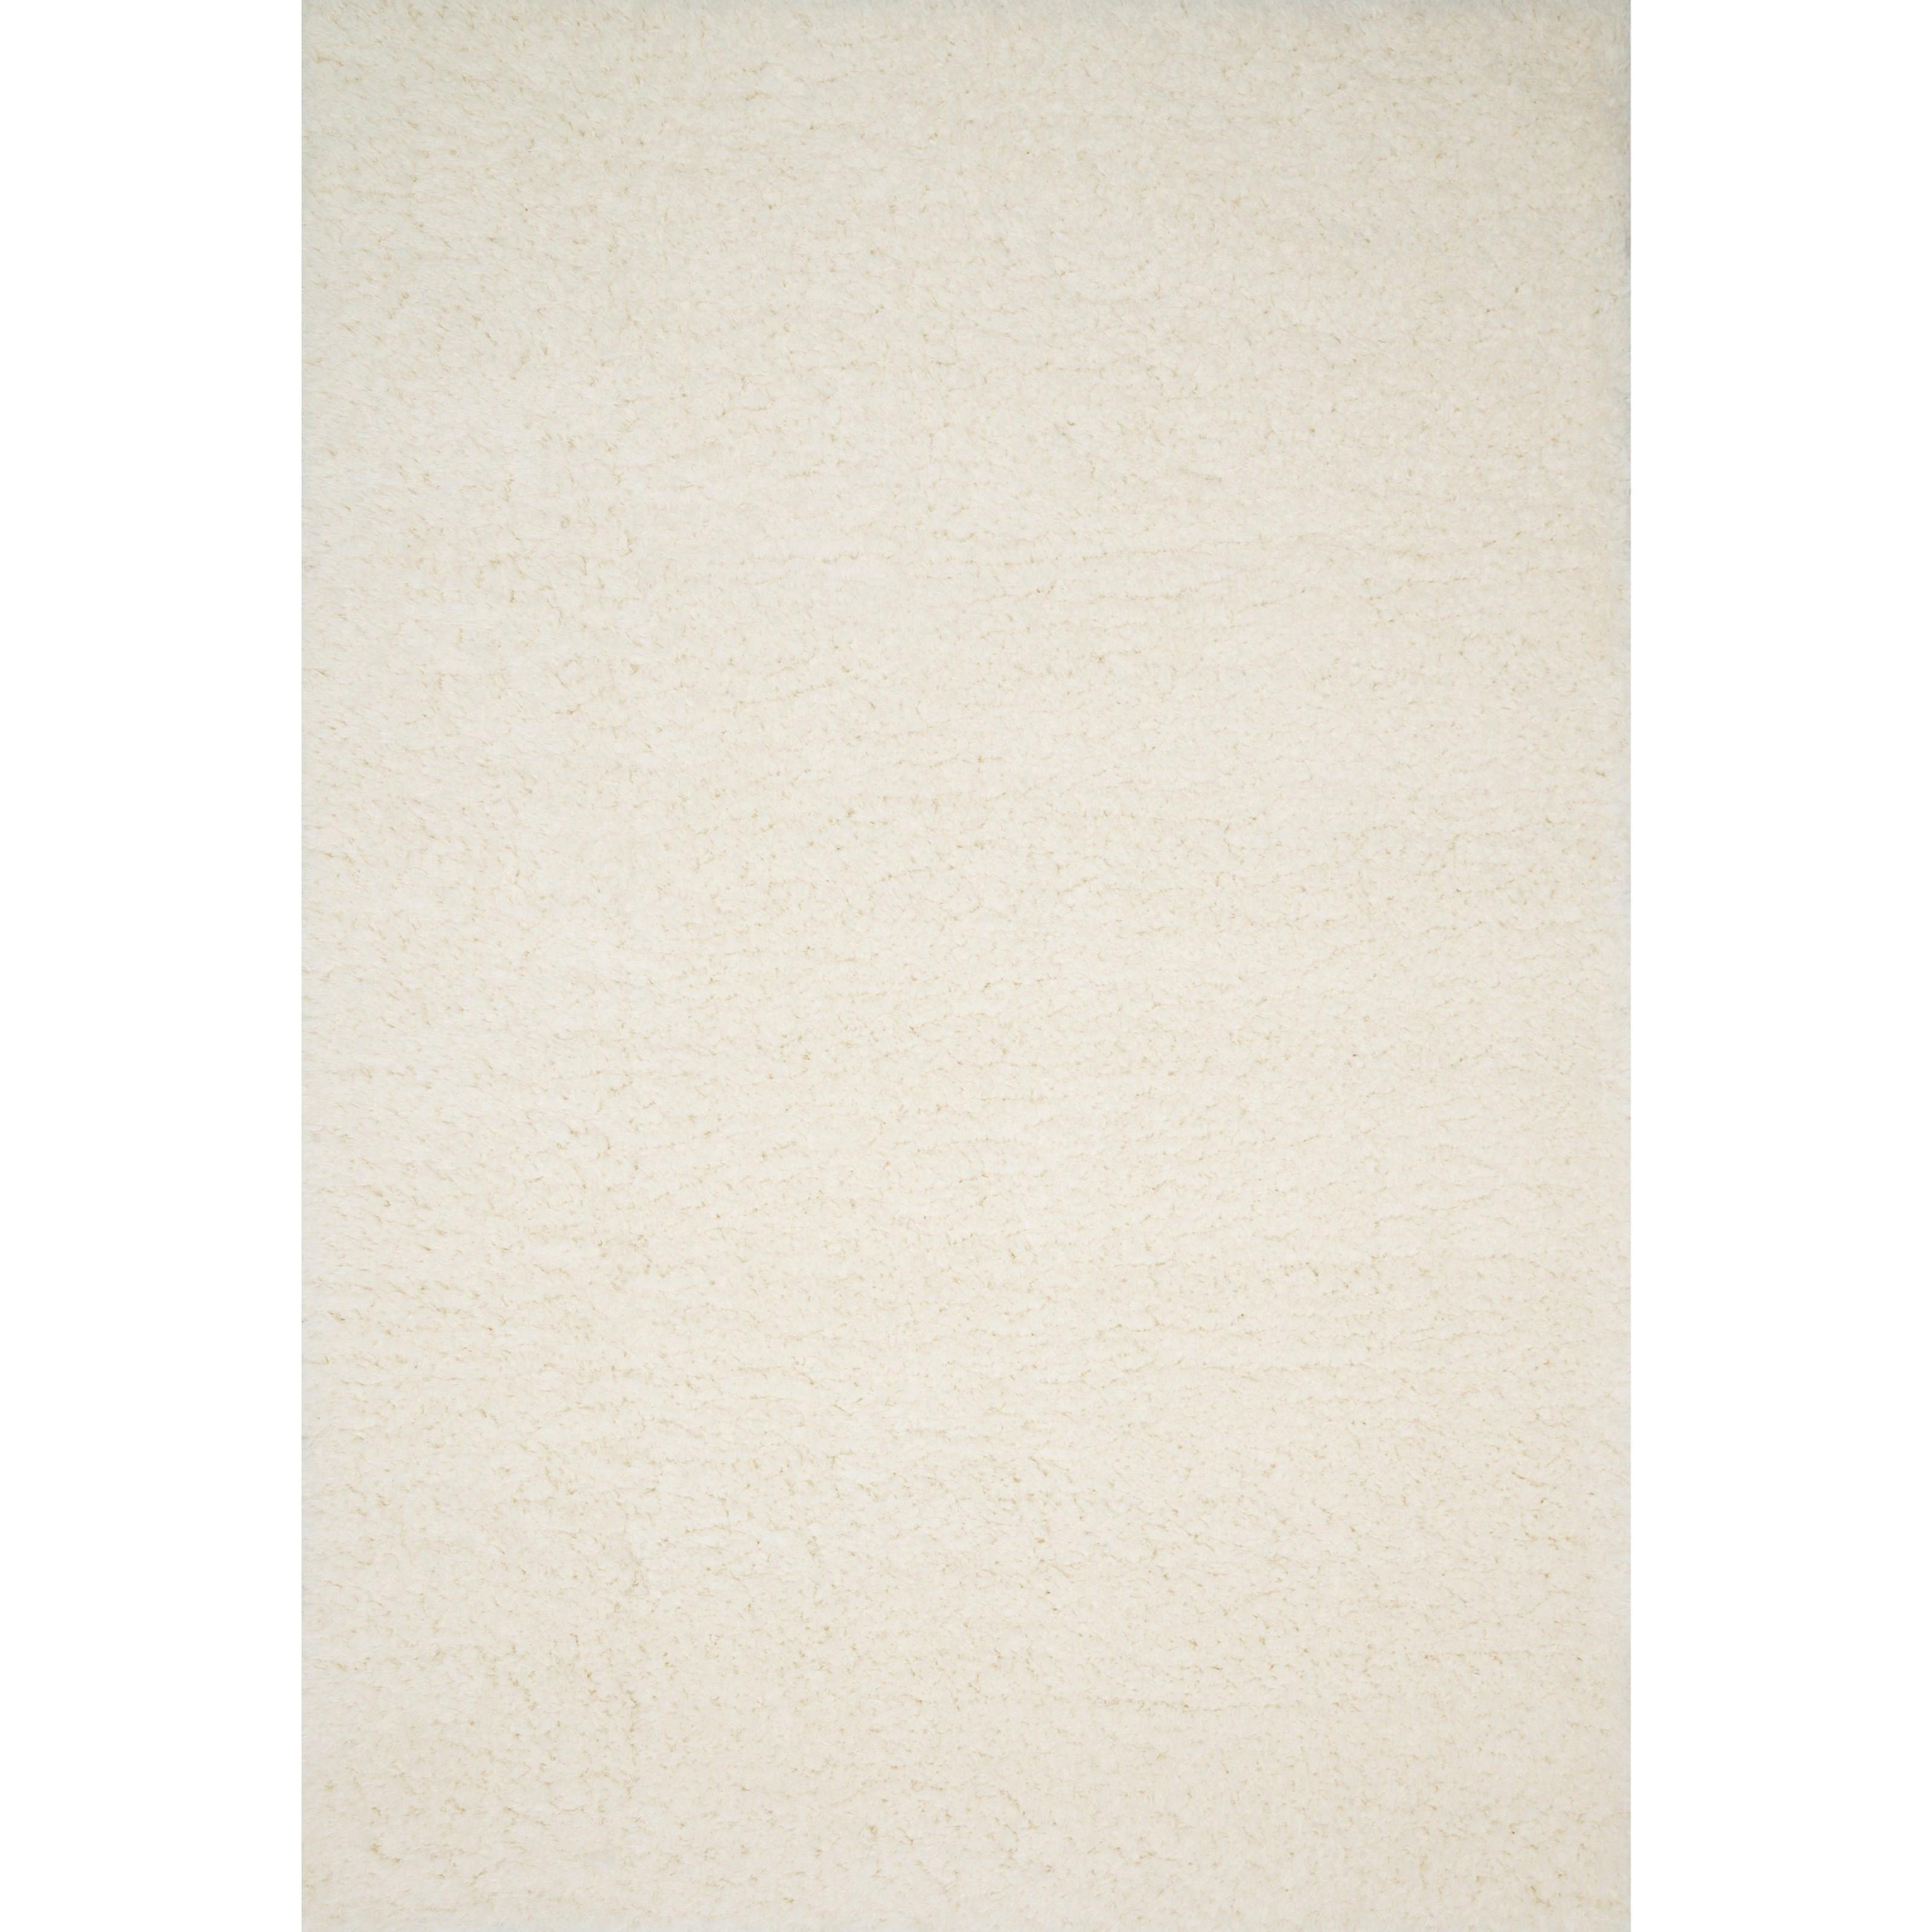 "Kayla Shag 3'-9"" x 5'-9"" Rug by Loloi Rugs at Sprintz Furniture"